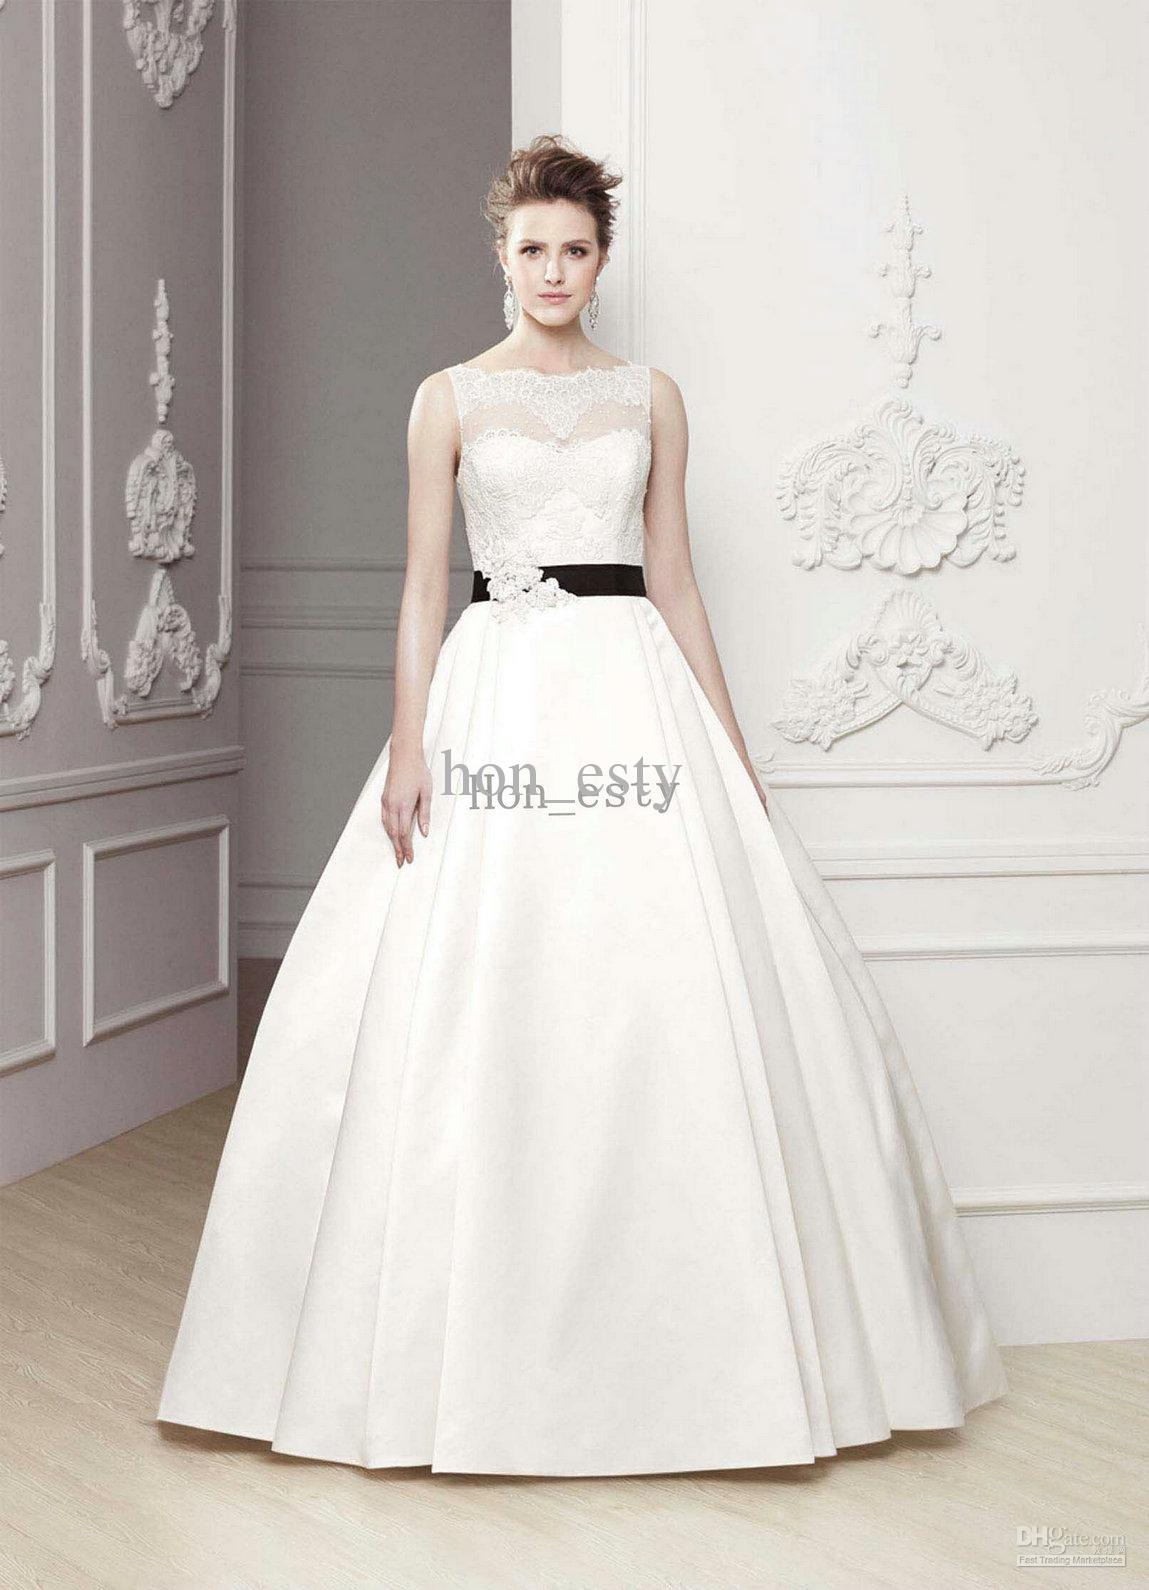 Colorful Lovely Wedding Dresses Embellishment - Wedding Dress Ideas ...